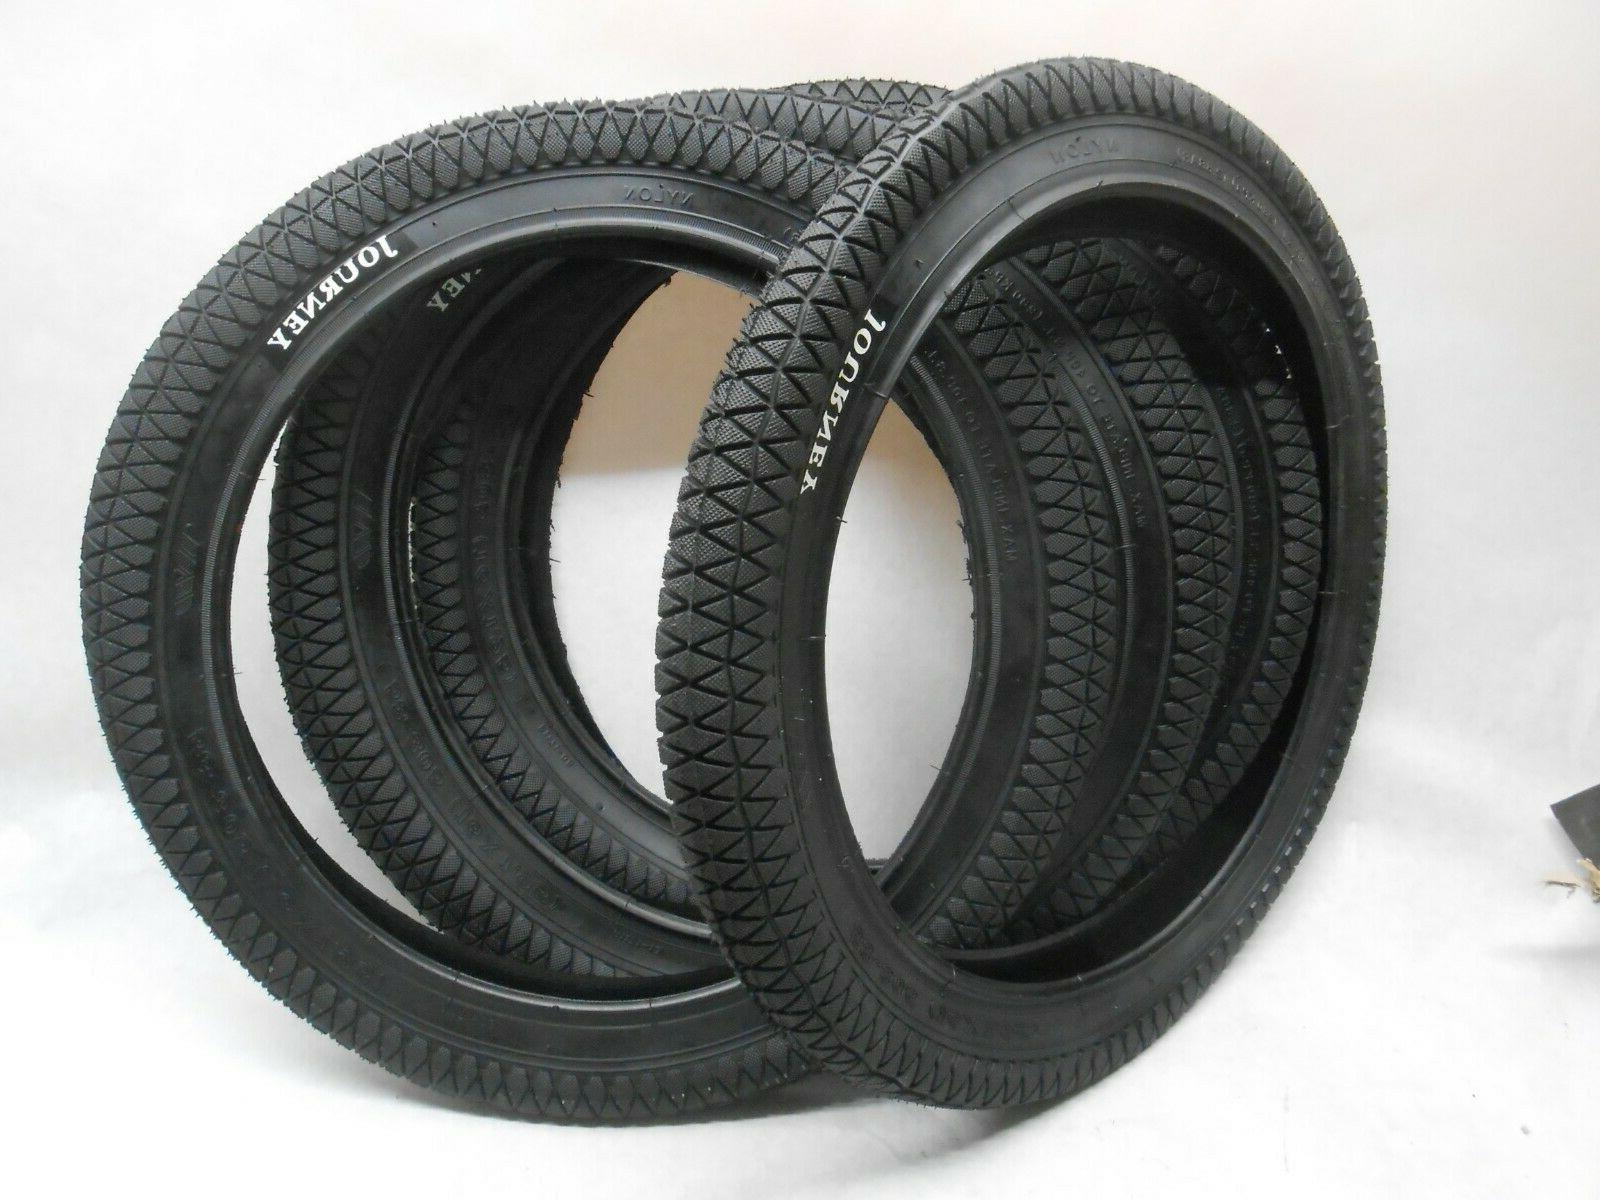 16 bmx street tire grippy slick tire